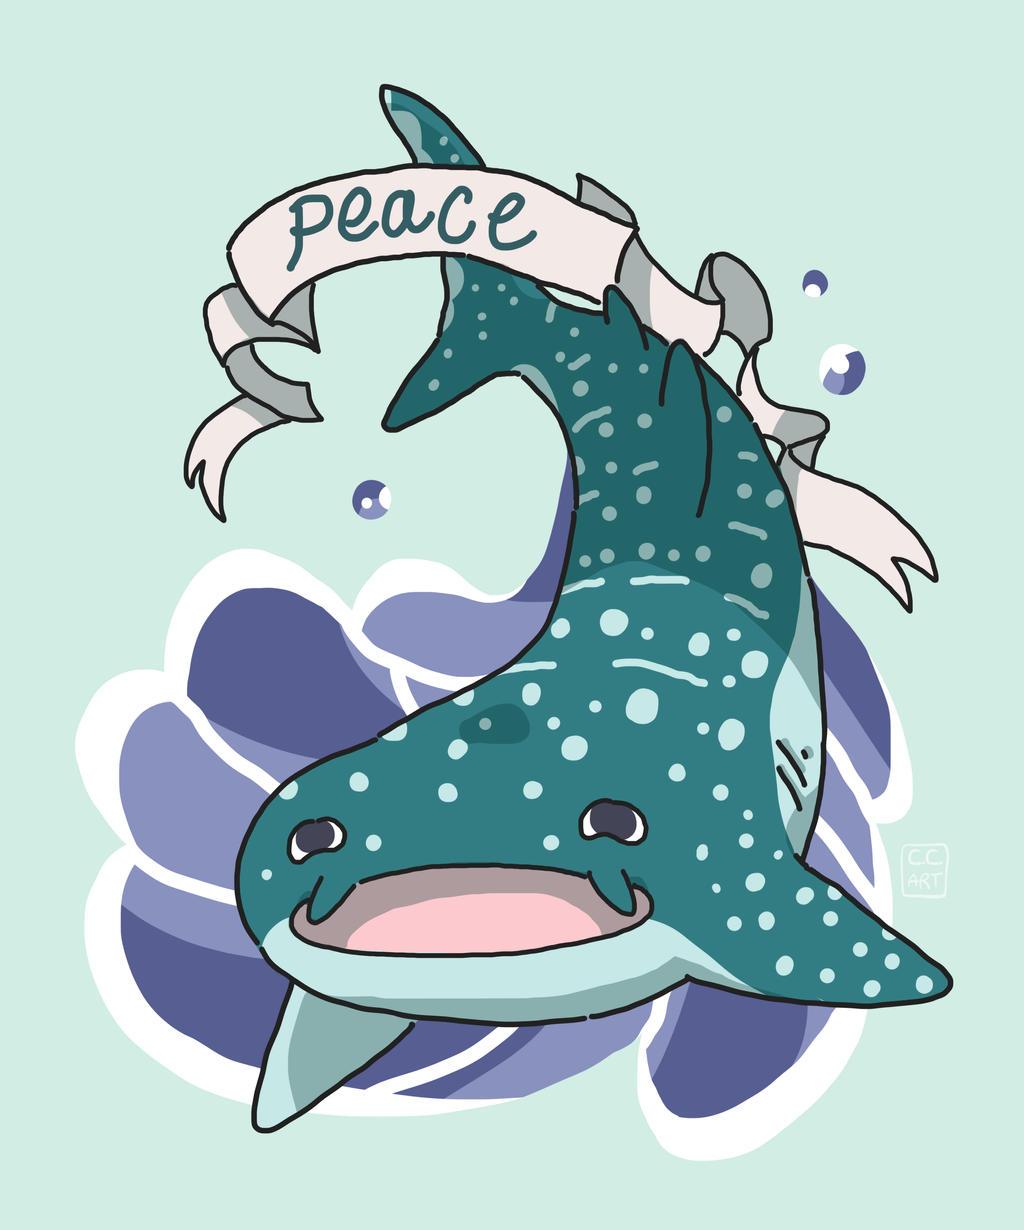 peace by ccartstuff